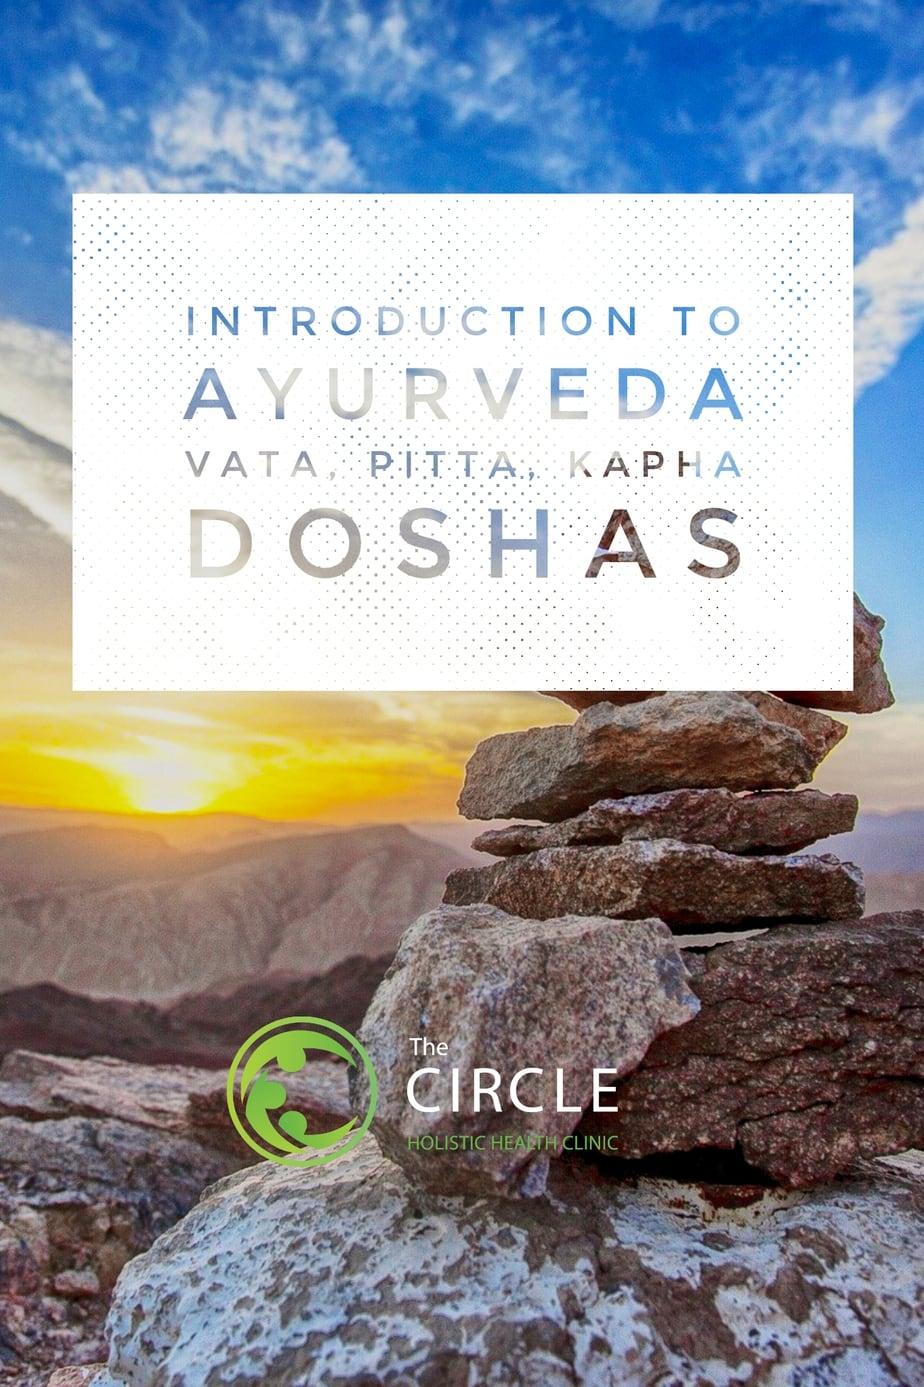 Introduction to Ayurveda Doshas